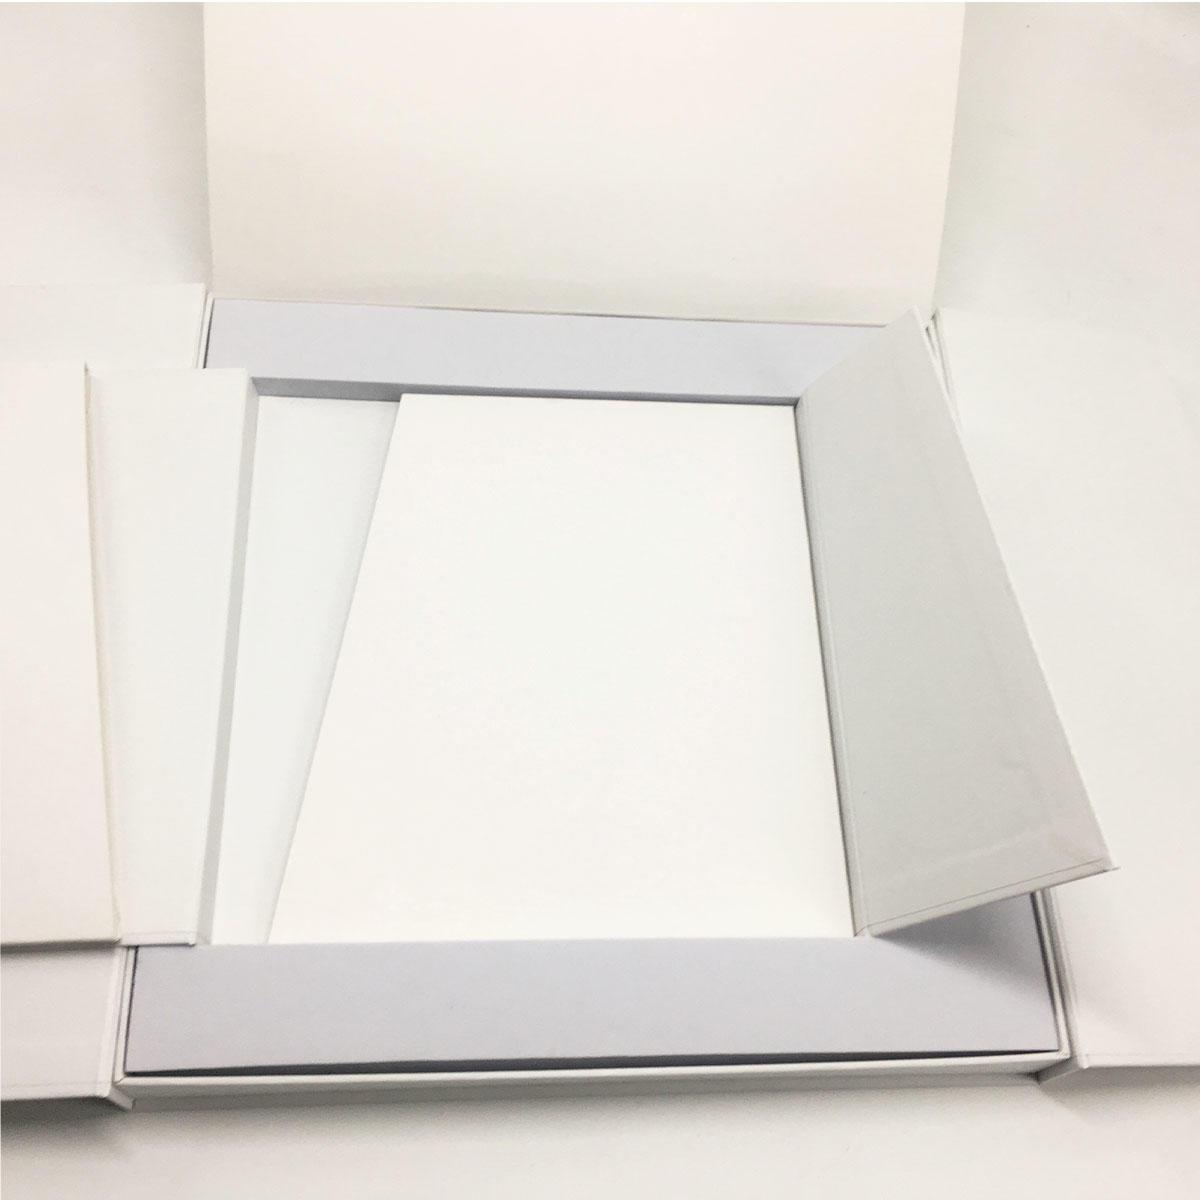 Creative folding flat pack branding packaging